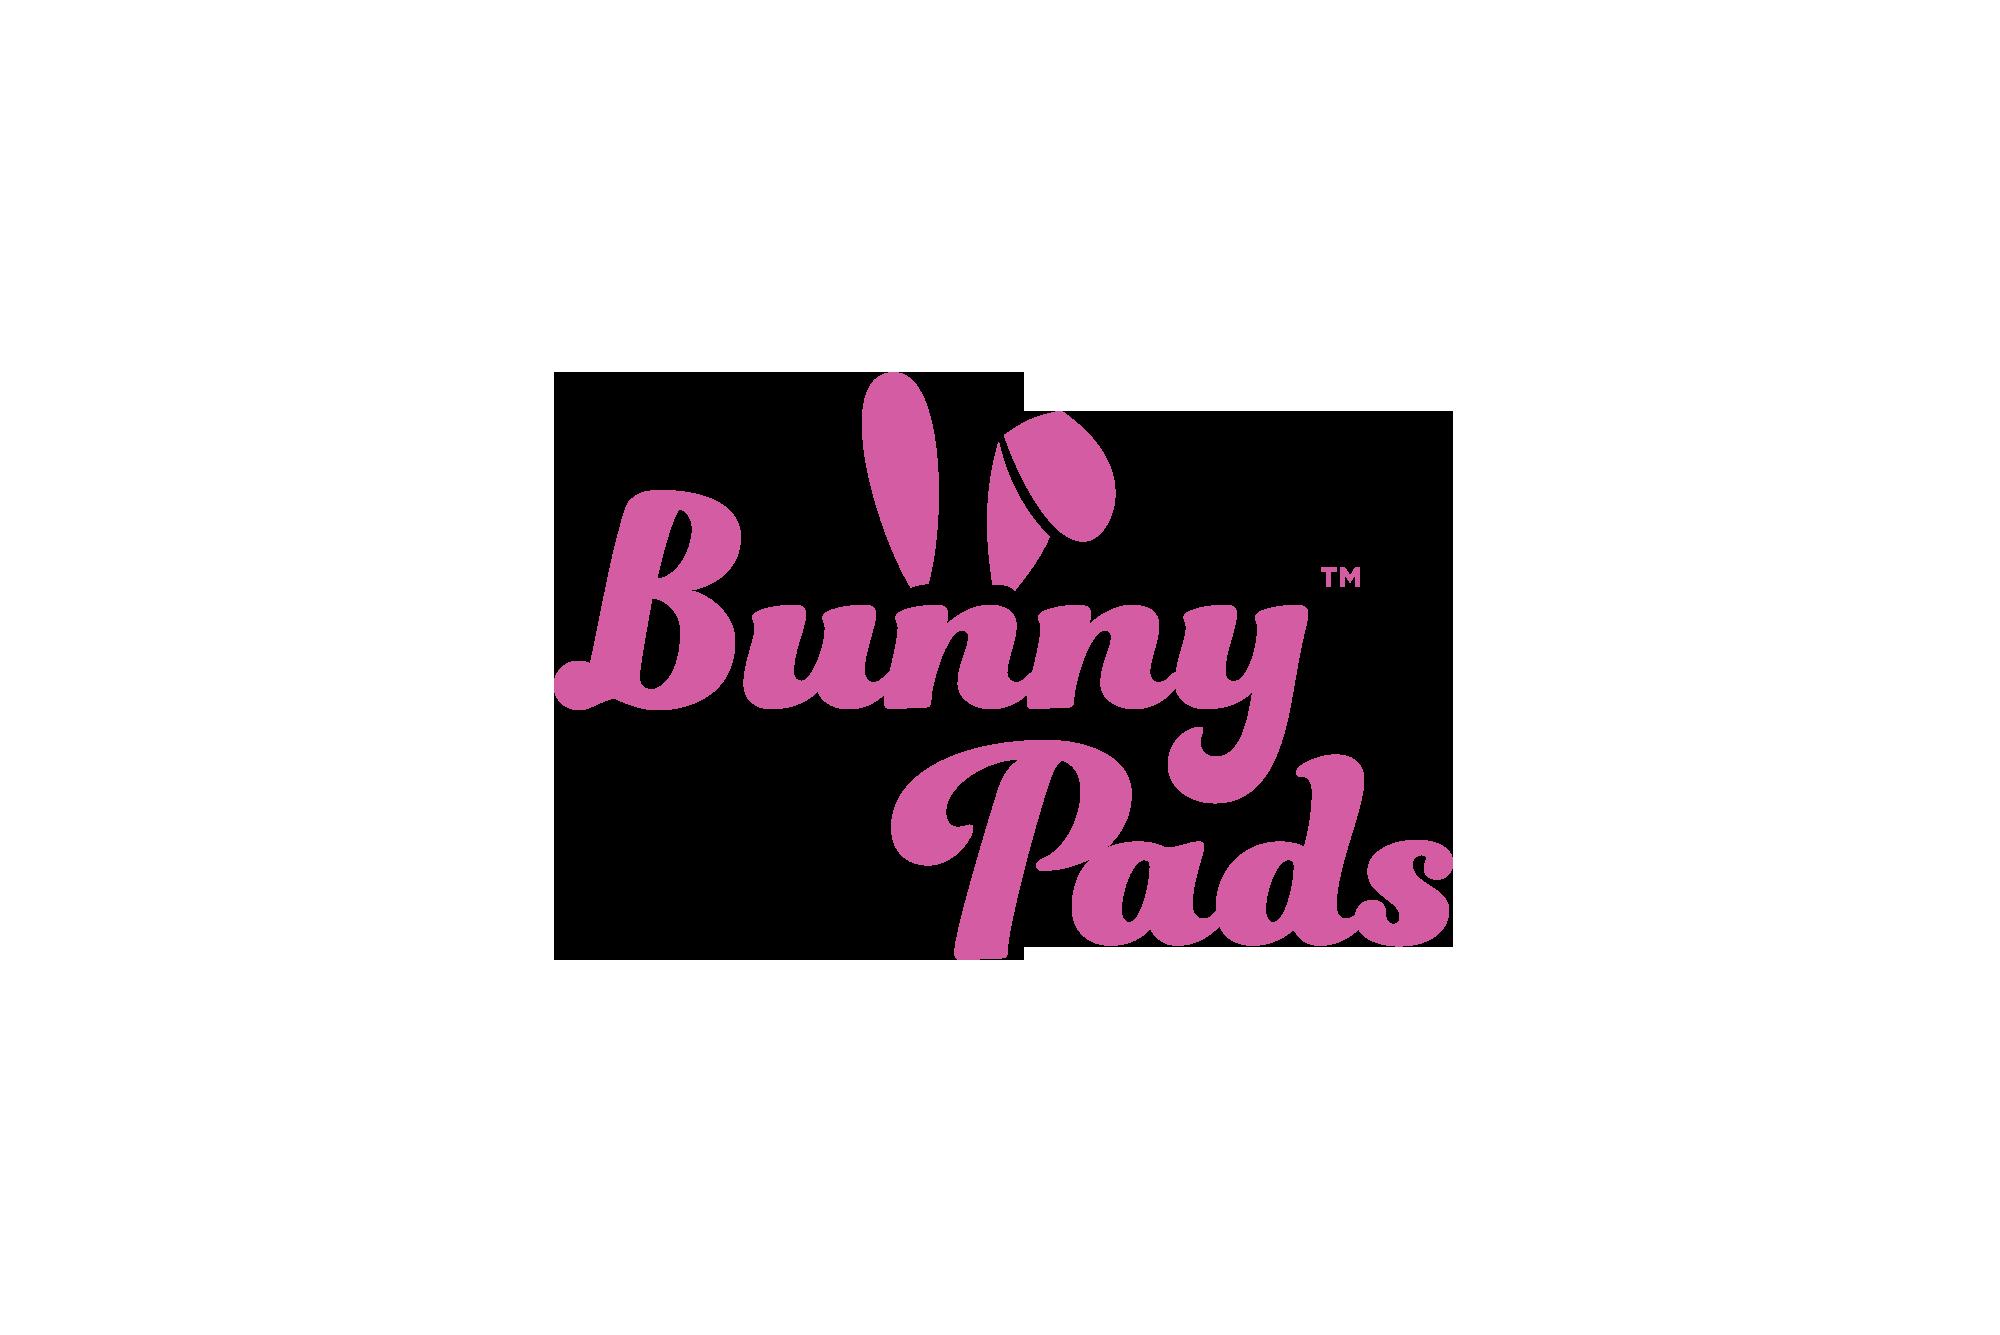 http://dubaipodiatry.com/wp-content/uploads/2015/12/DPC_logos_bunnypads.png